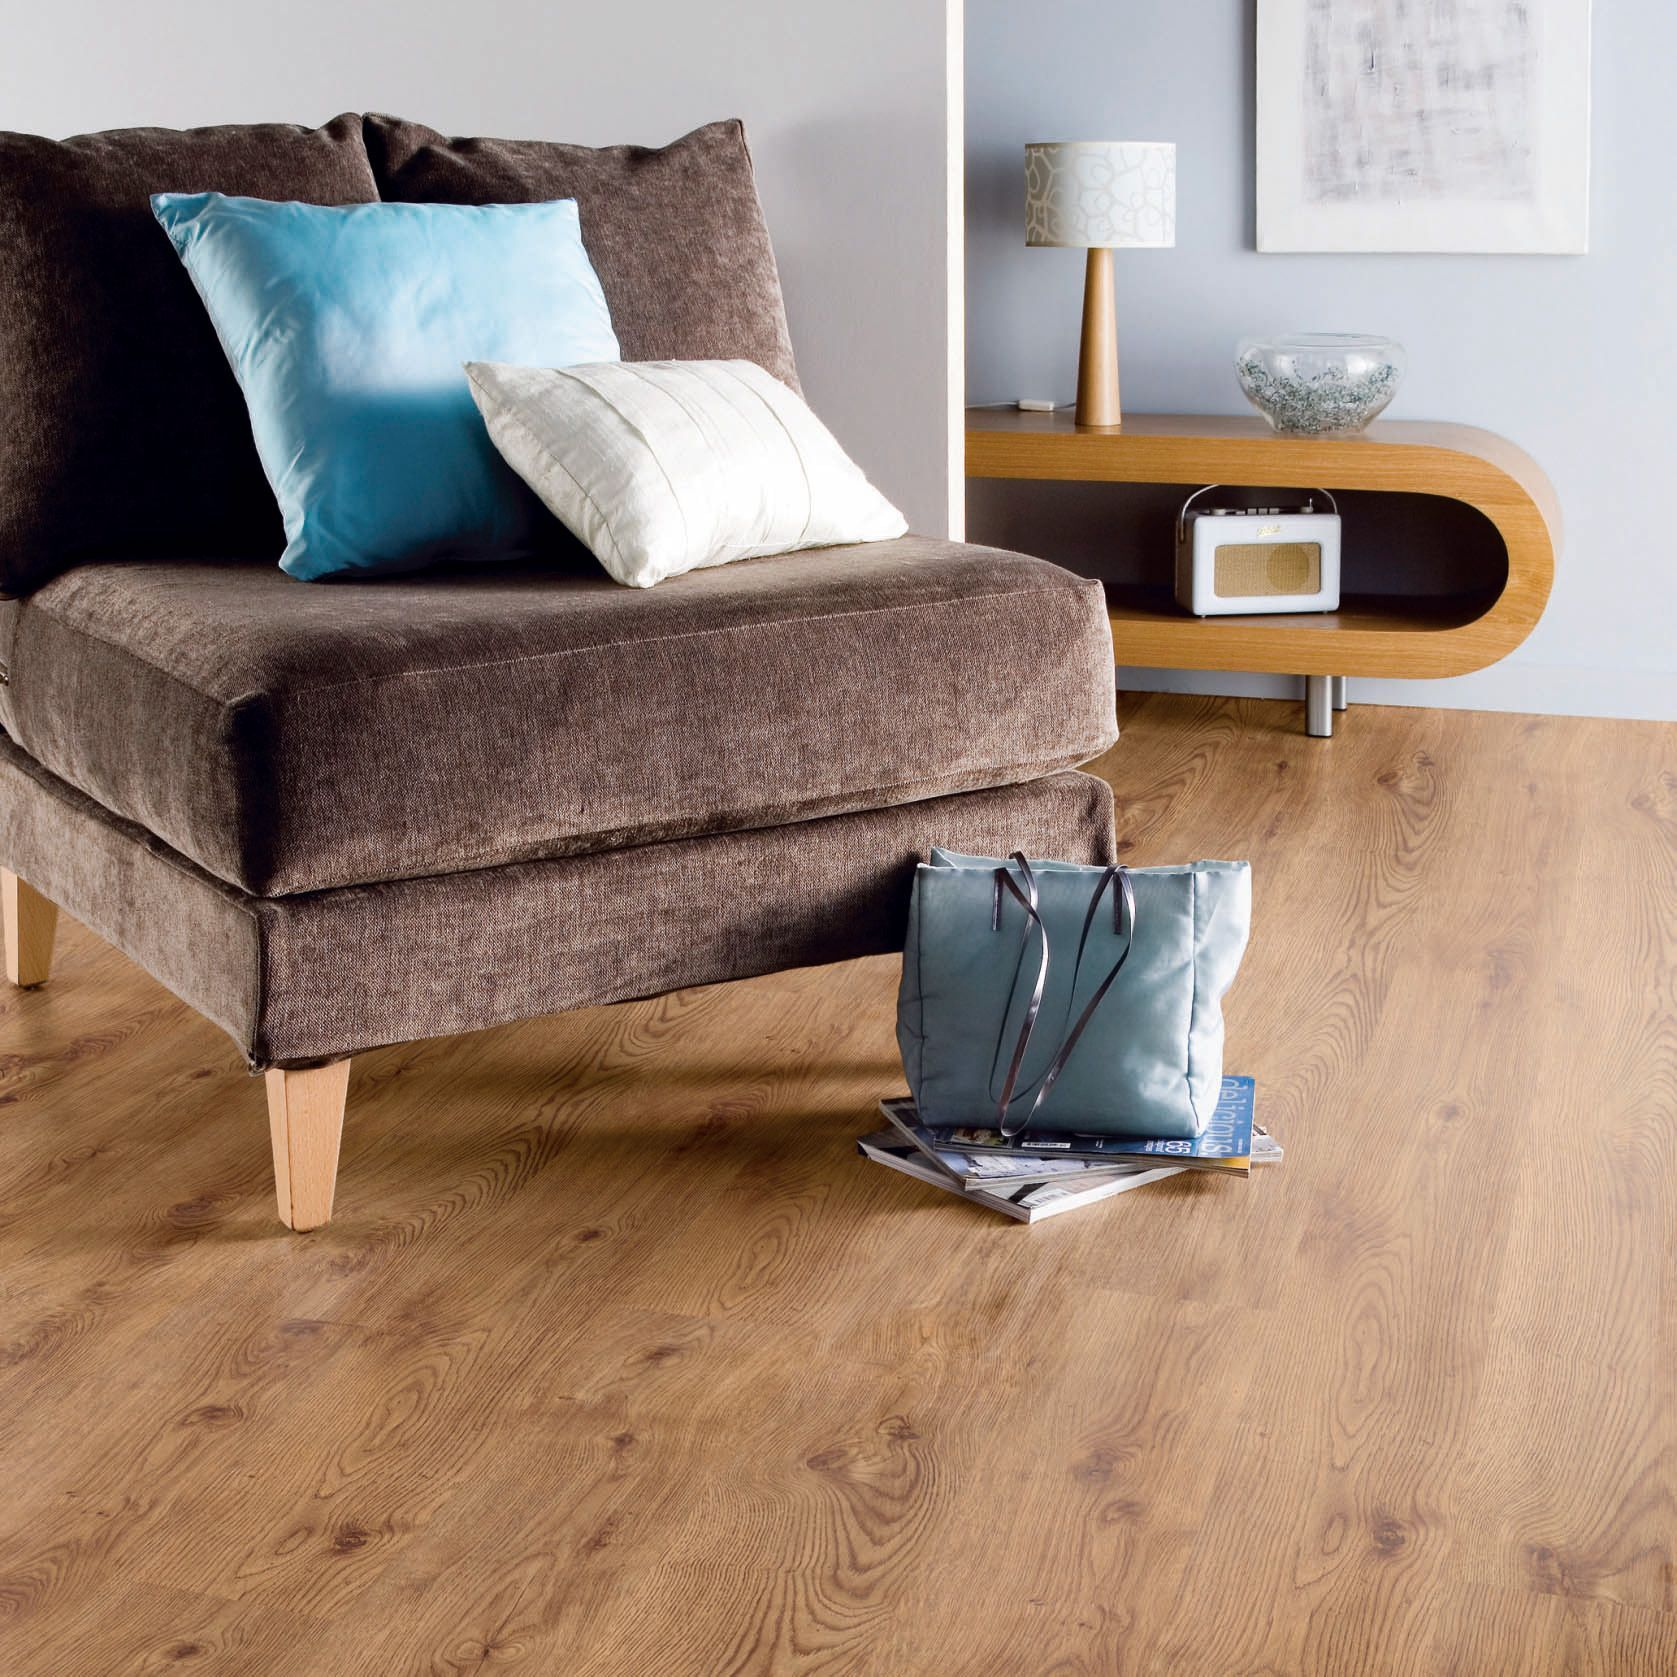 Bq country oak effect glueless laminate flooring 25m pack bq country oak effect glueless laminate flooring 25m pack departments diy at bq dailygadgetfo Choice Image